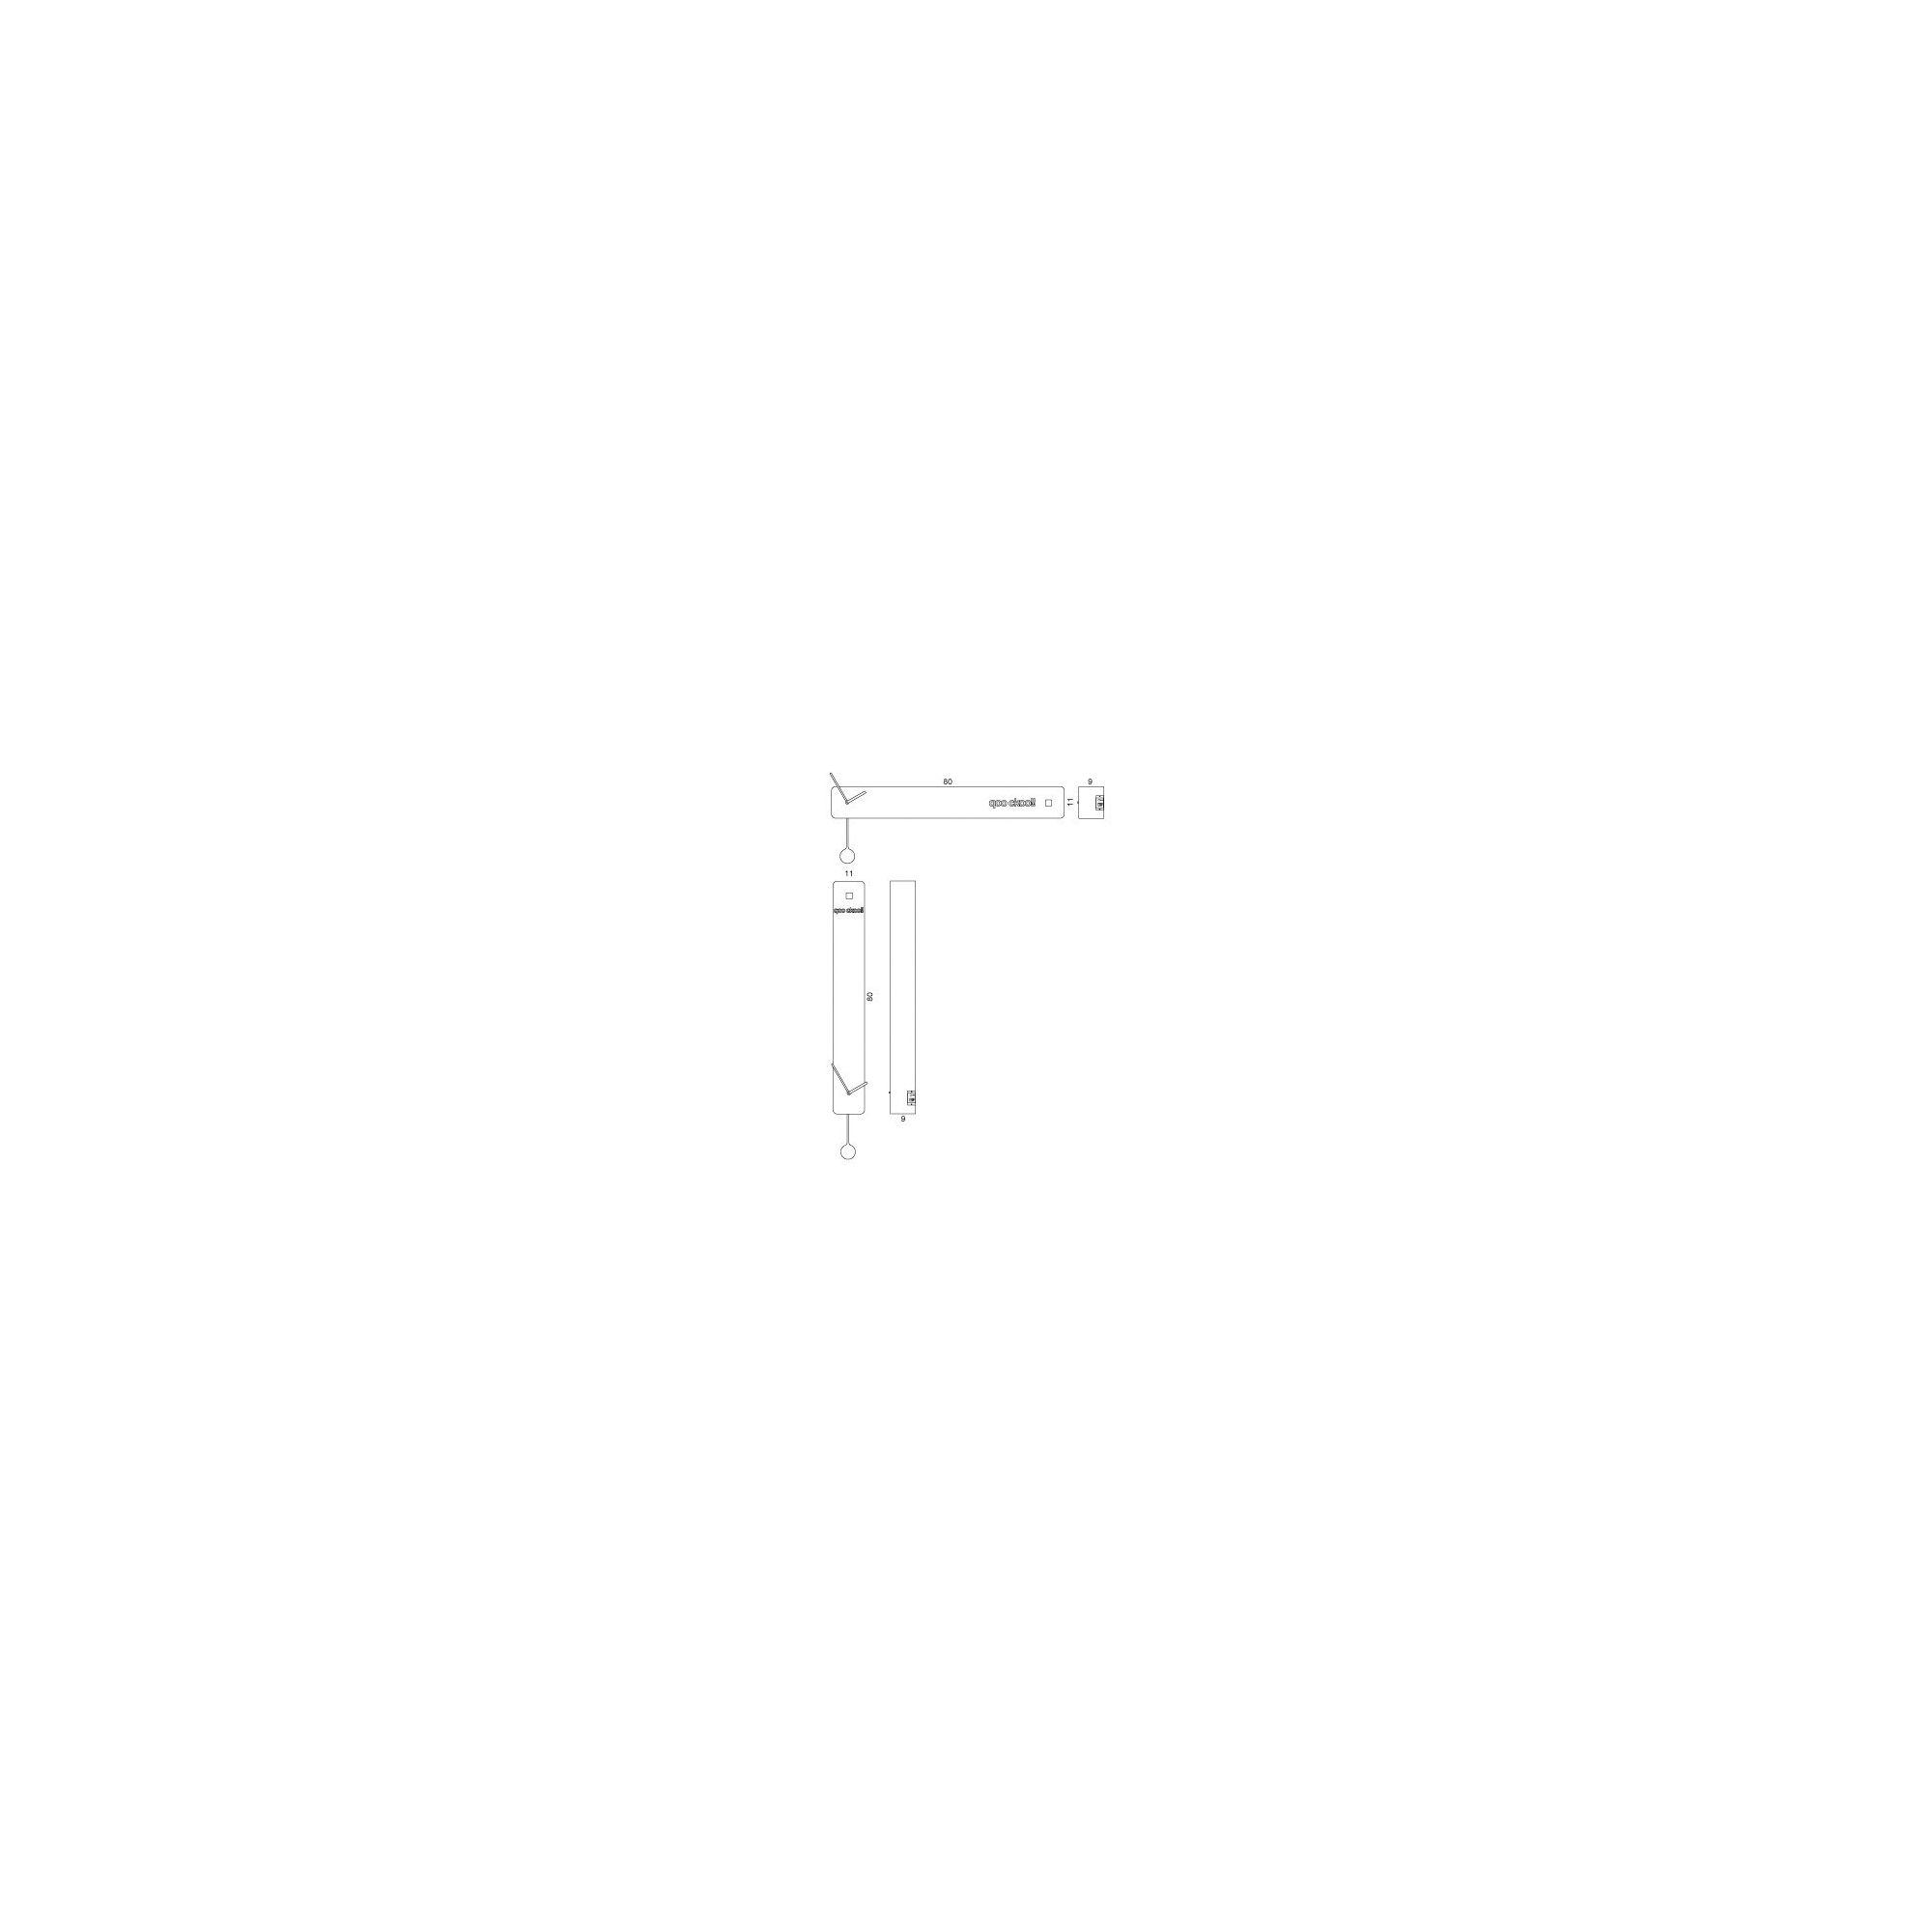 Progetti q02 Vertical Wall Clock - Black at Tesco Direct